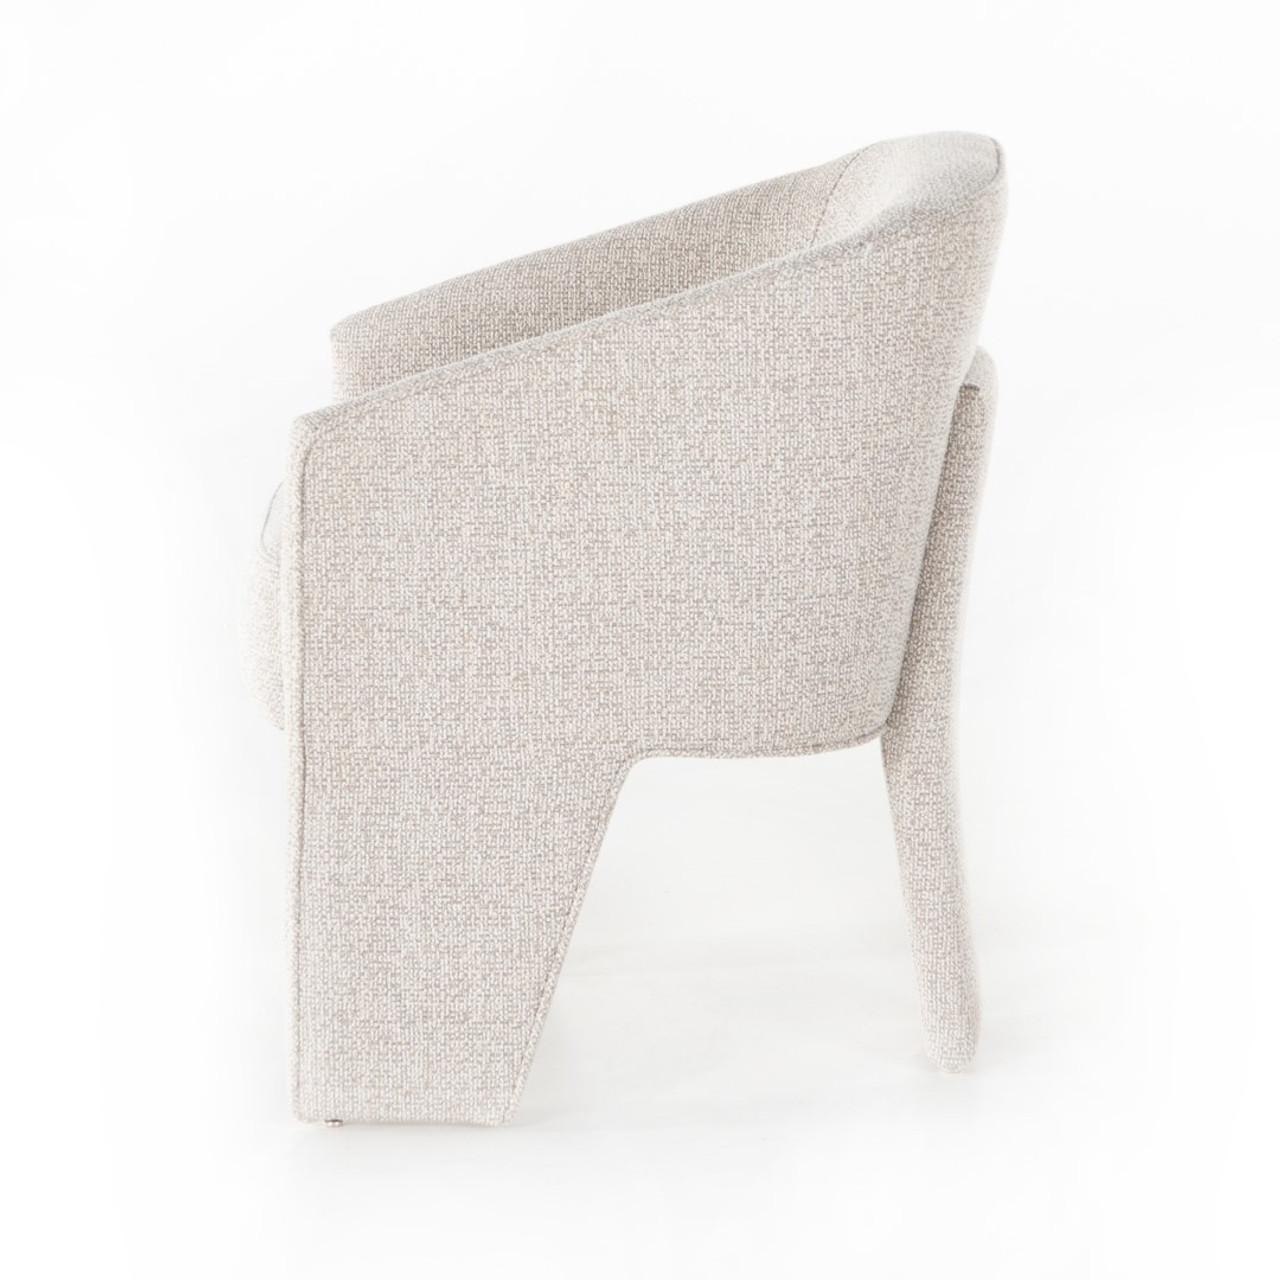 Farrah Dining Chair - Bellamy Storm